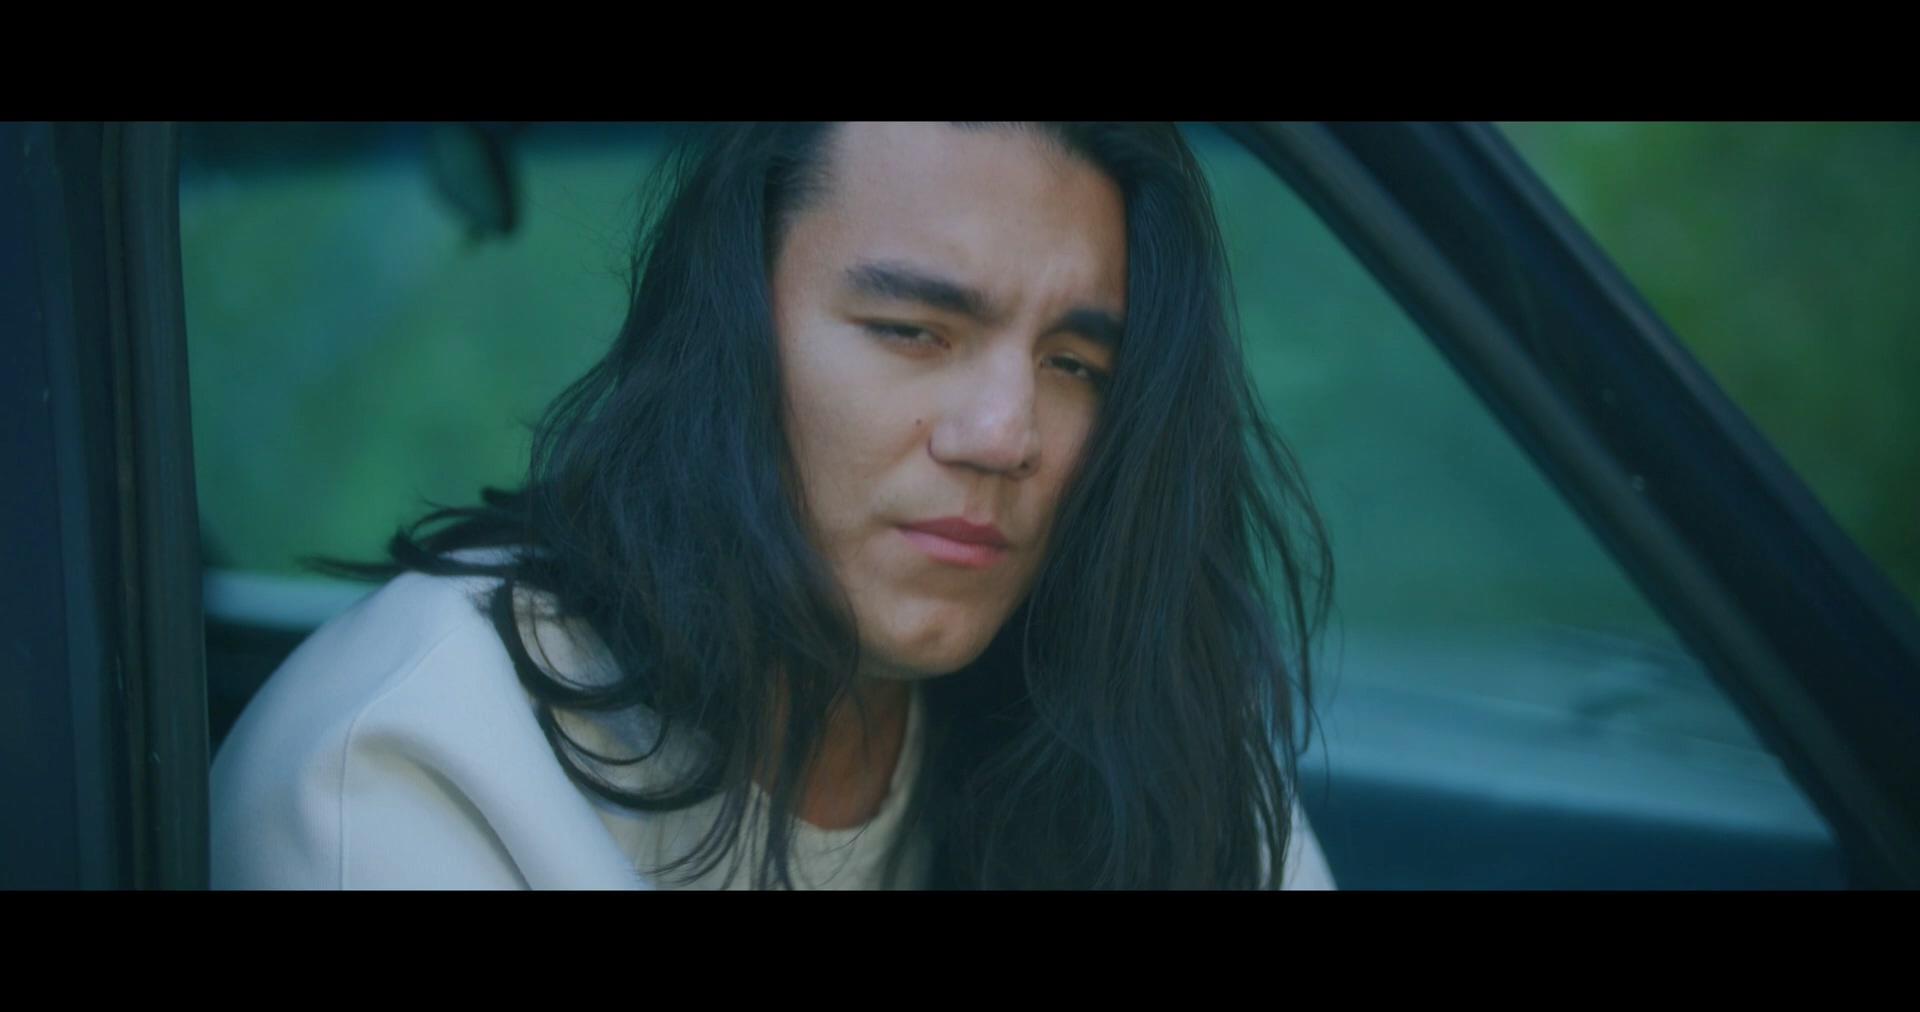 HAVANA feat. Kanita - Serenata Mexicana перевод